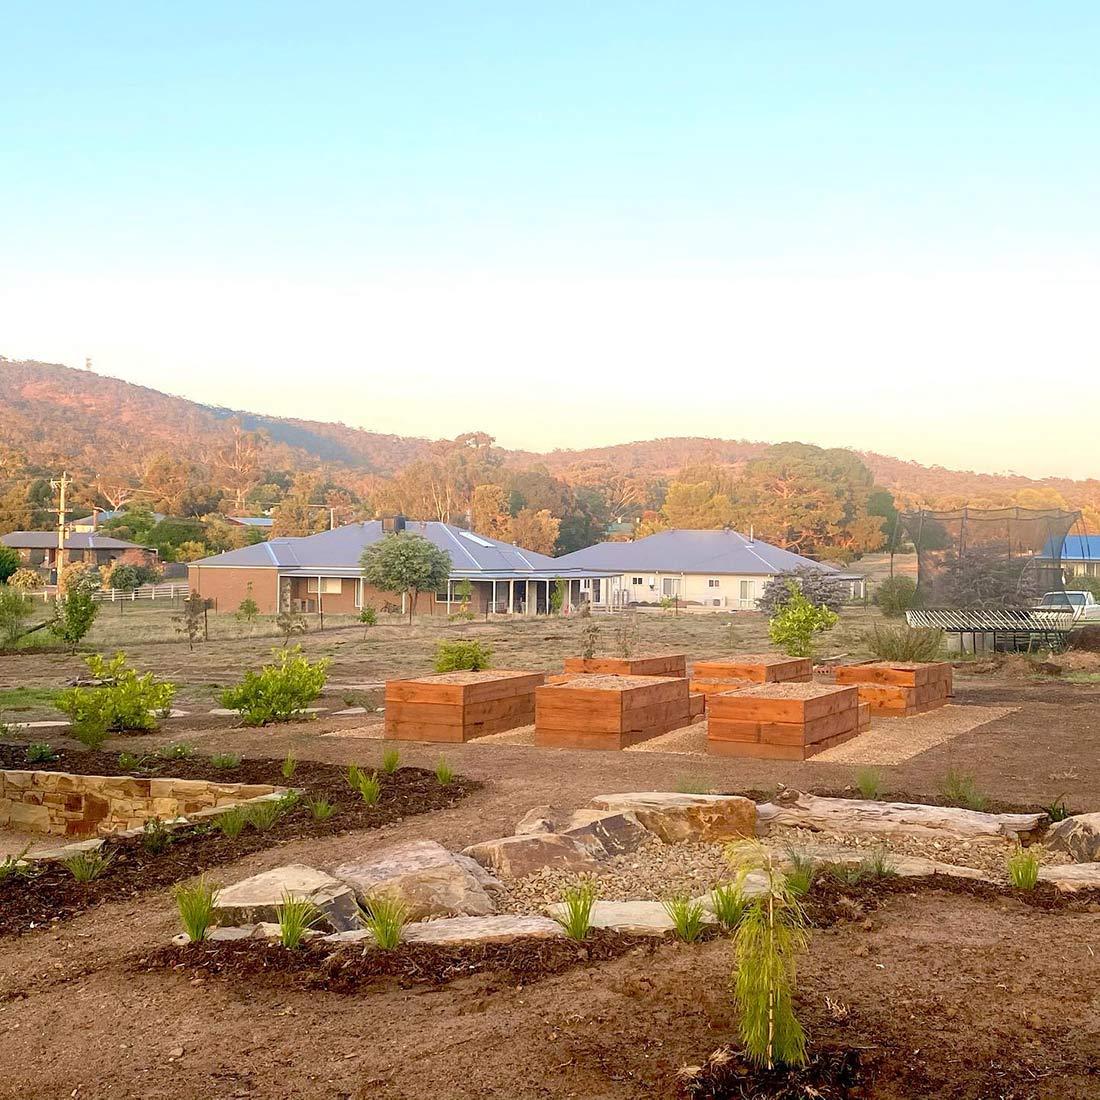 Dry creek and Vegetable garden